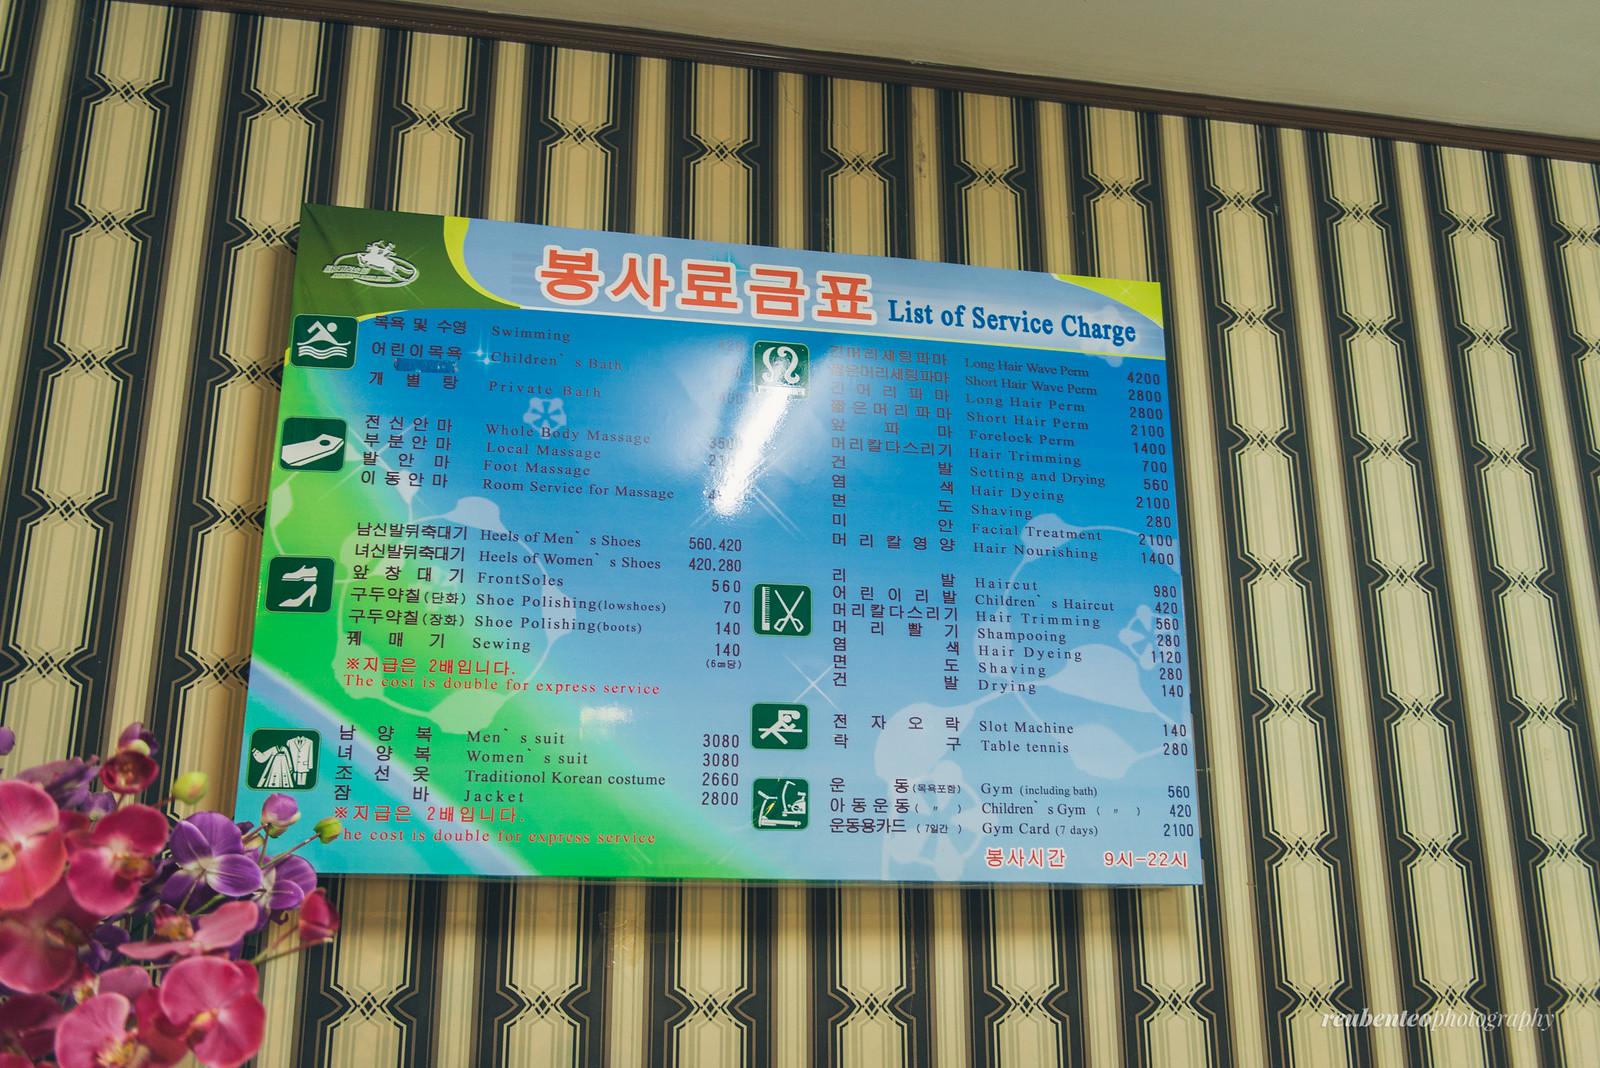 Facilities Board